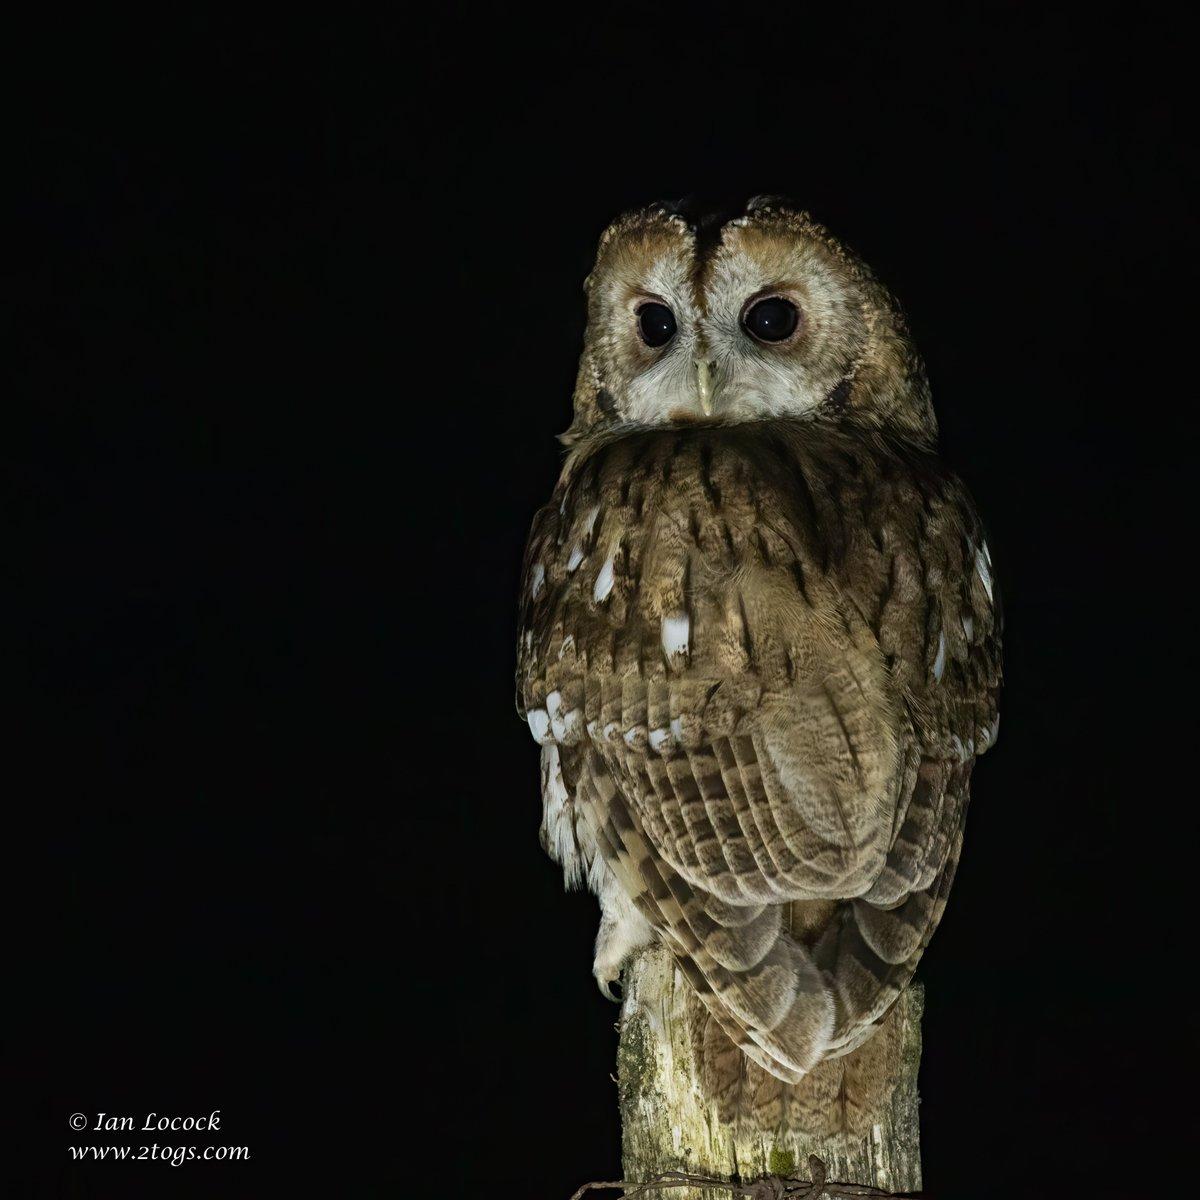 Tawny Owl - Dumfries & Galloway, Scotland  #Birds #wildlife #wildlifephotography #nature #naturephotography #2togs #ianlocock #owls https://t.co/lUTJyF258j